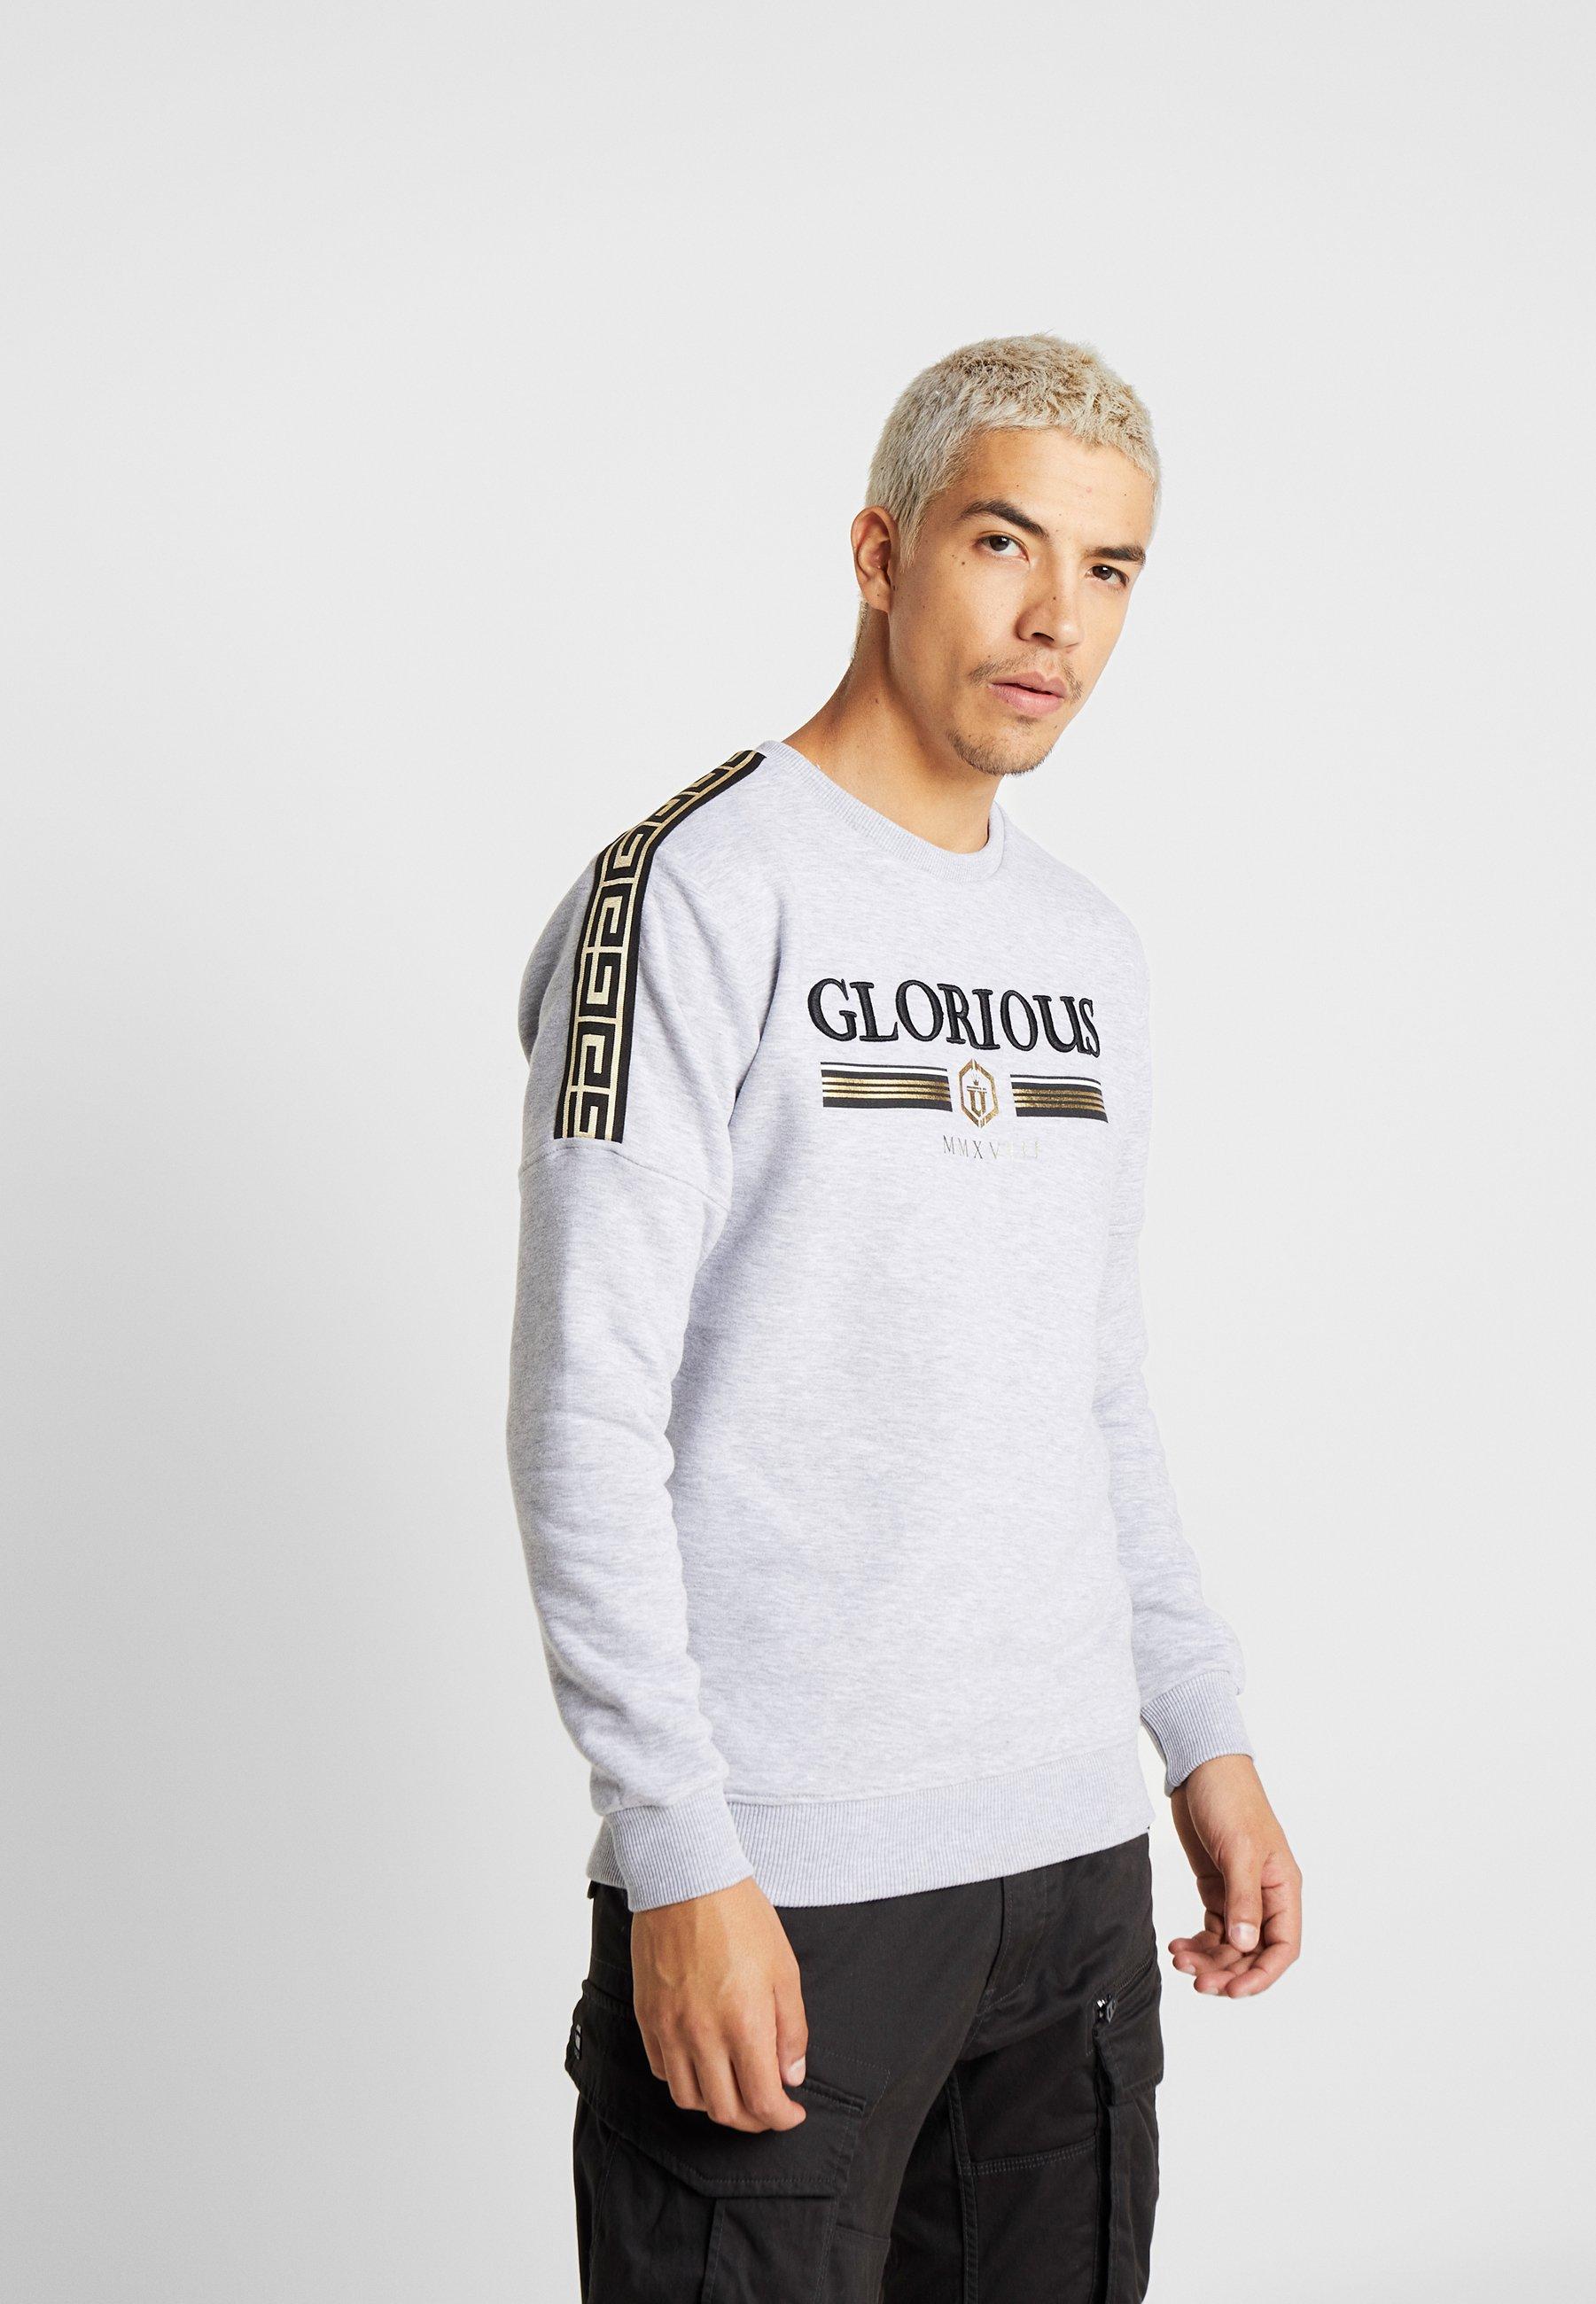 Gangsta Gangsta CrewSweatshirt Grey Kalk Glorious Grey Glorious CrewSweatshirt Kalk Glorious Gangsta nXN0kw8OP